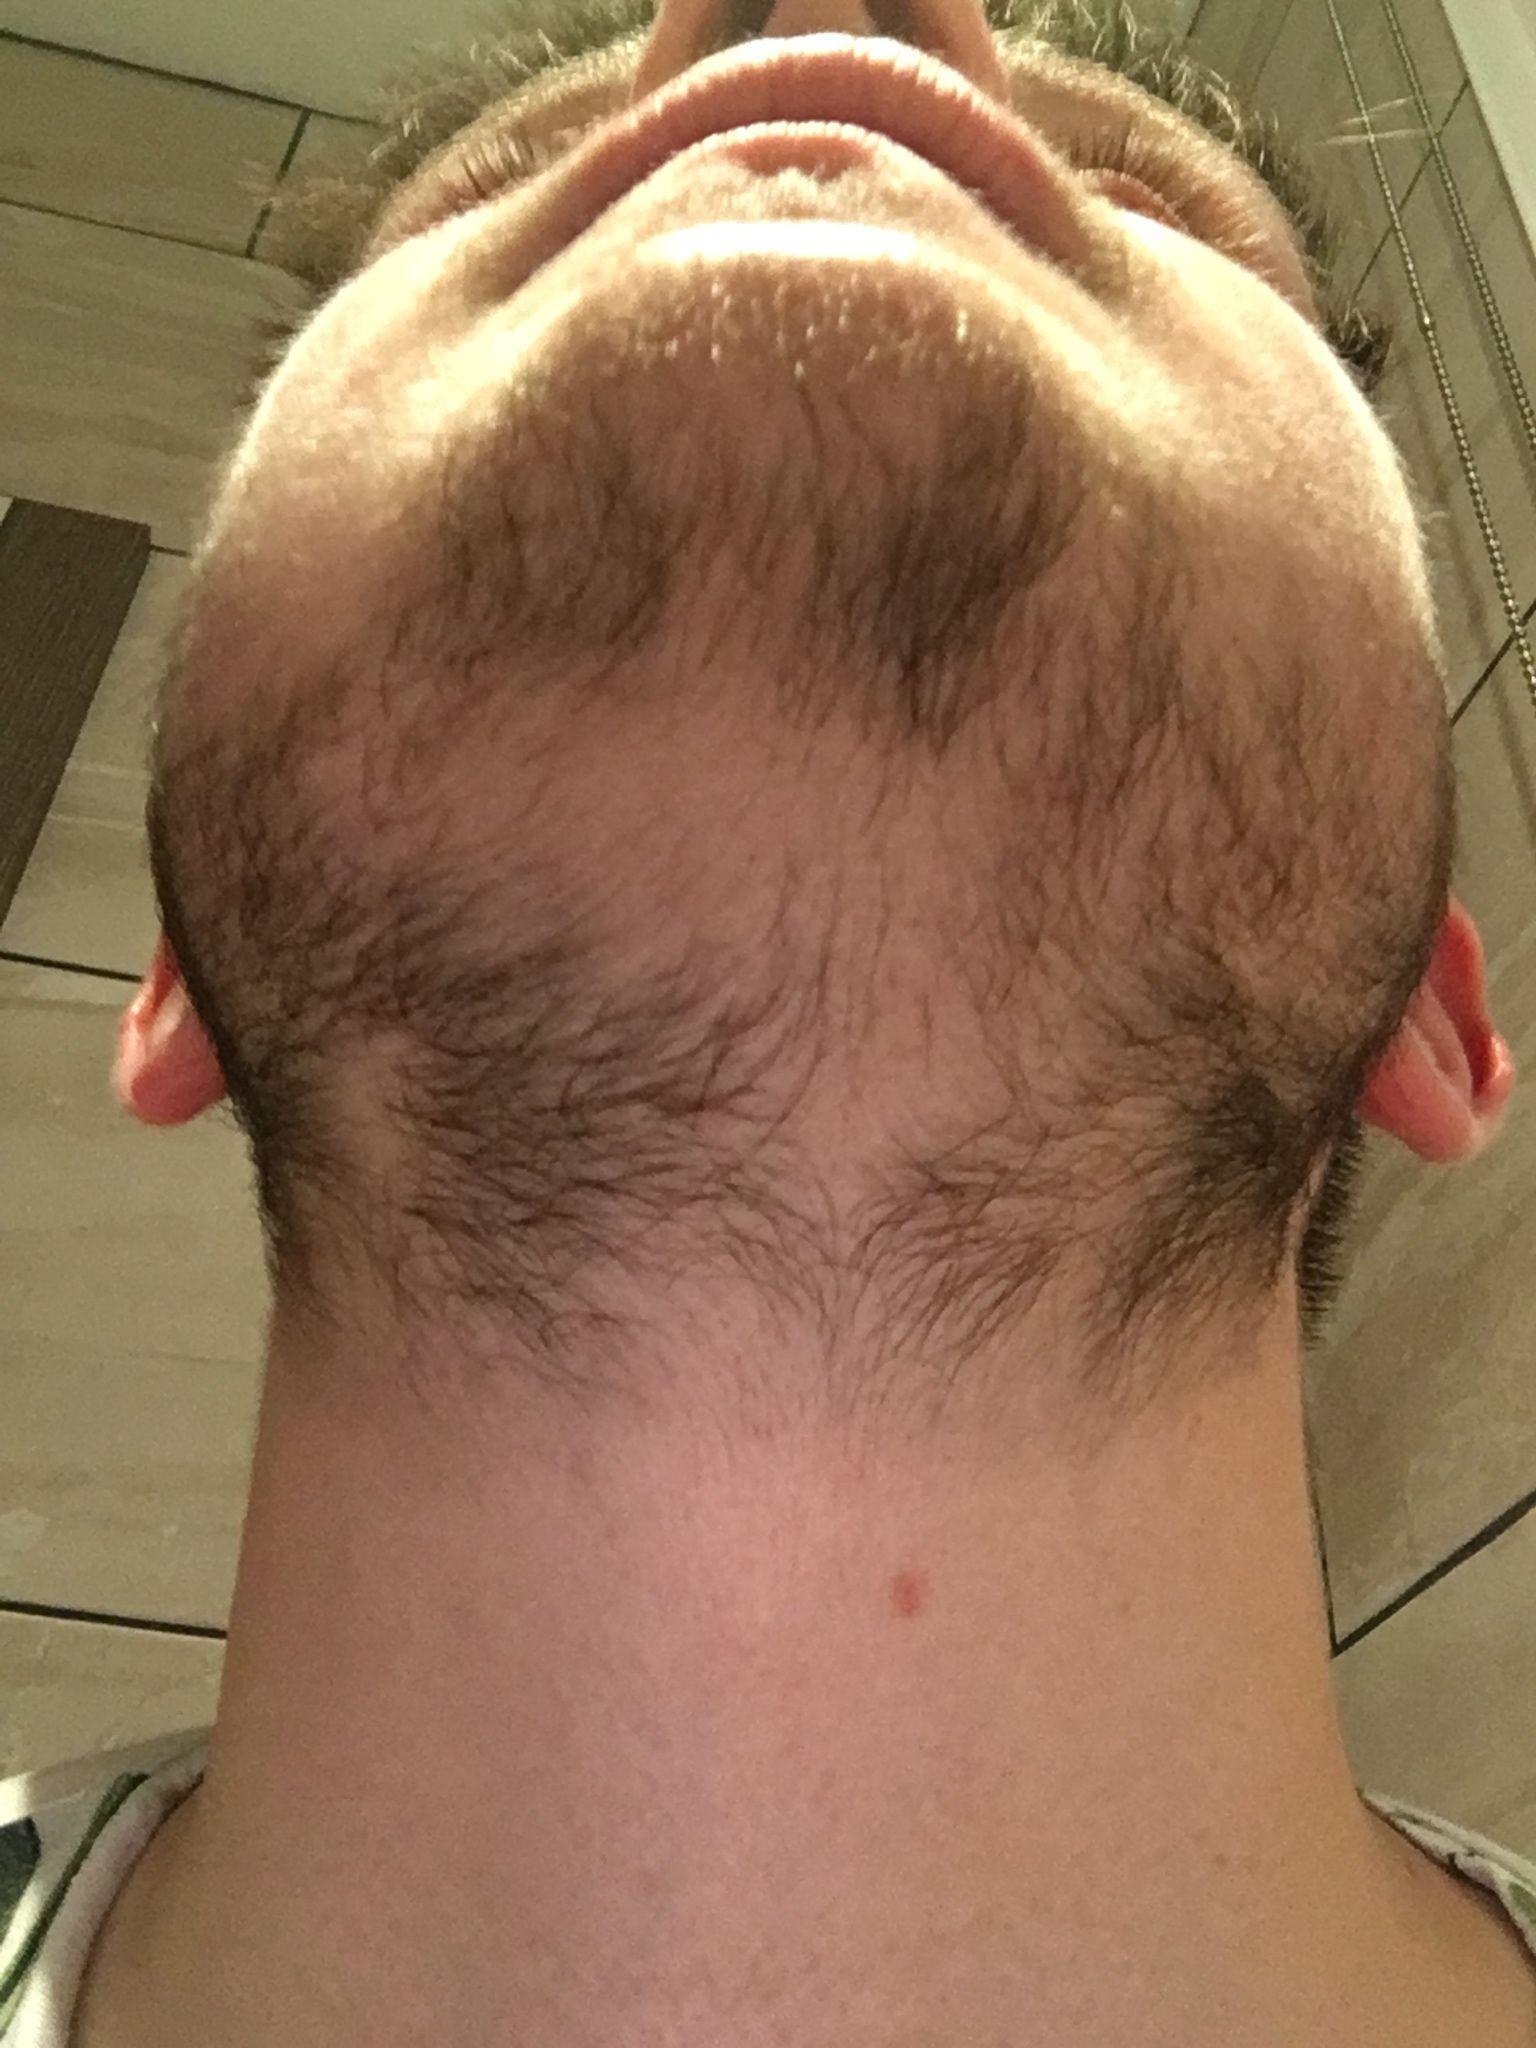 Around 6 Months Of Minoxidil Progress Not So Average Beard Styles